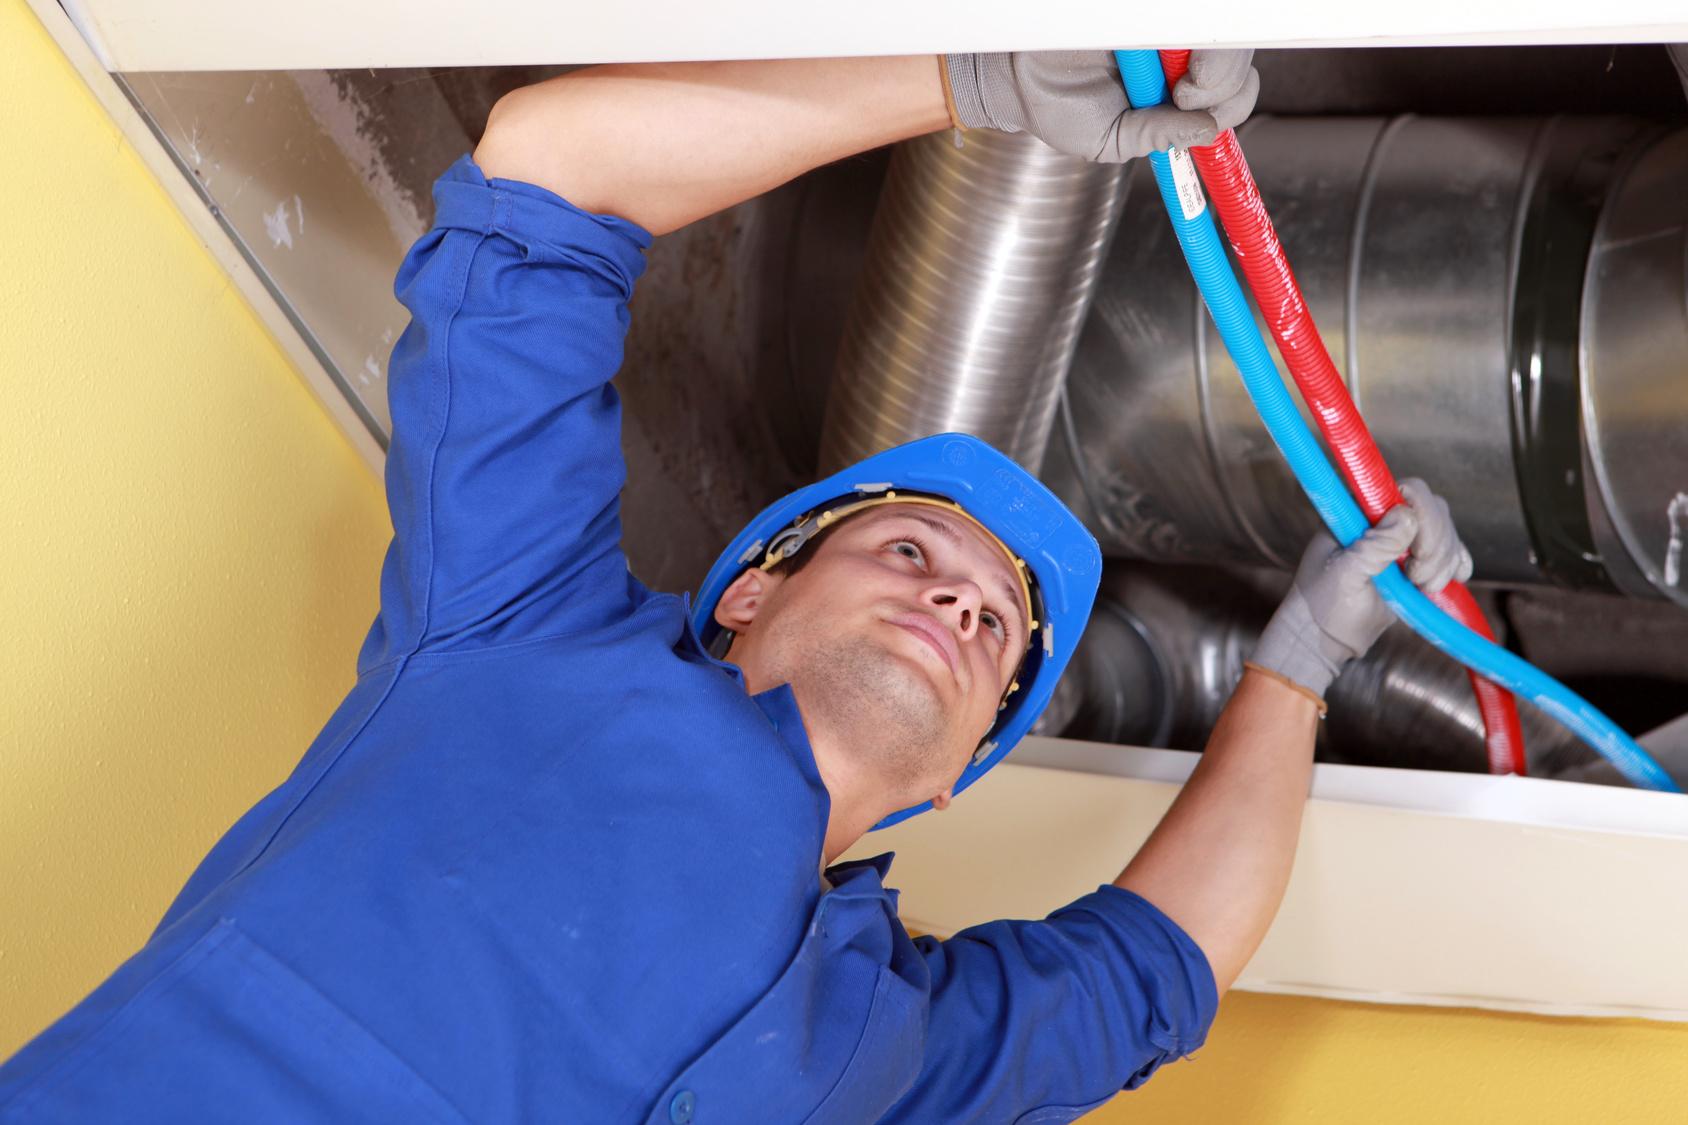 Монтаж вентиляции, цена за работу